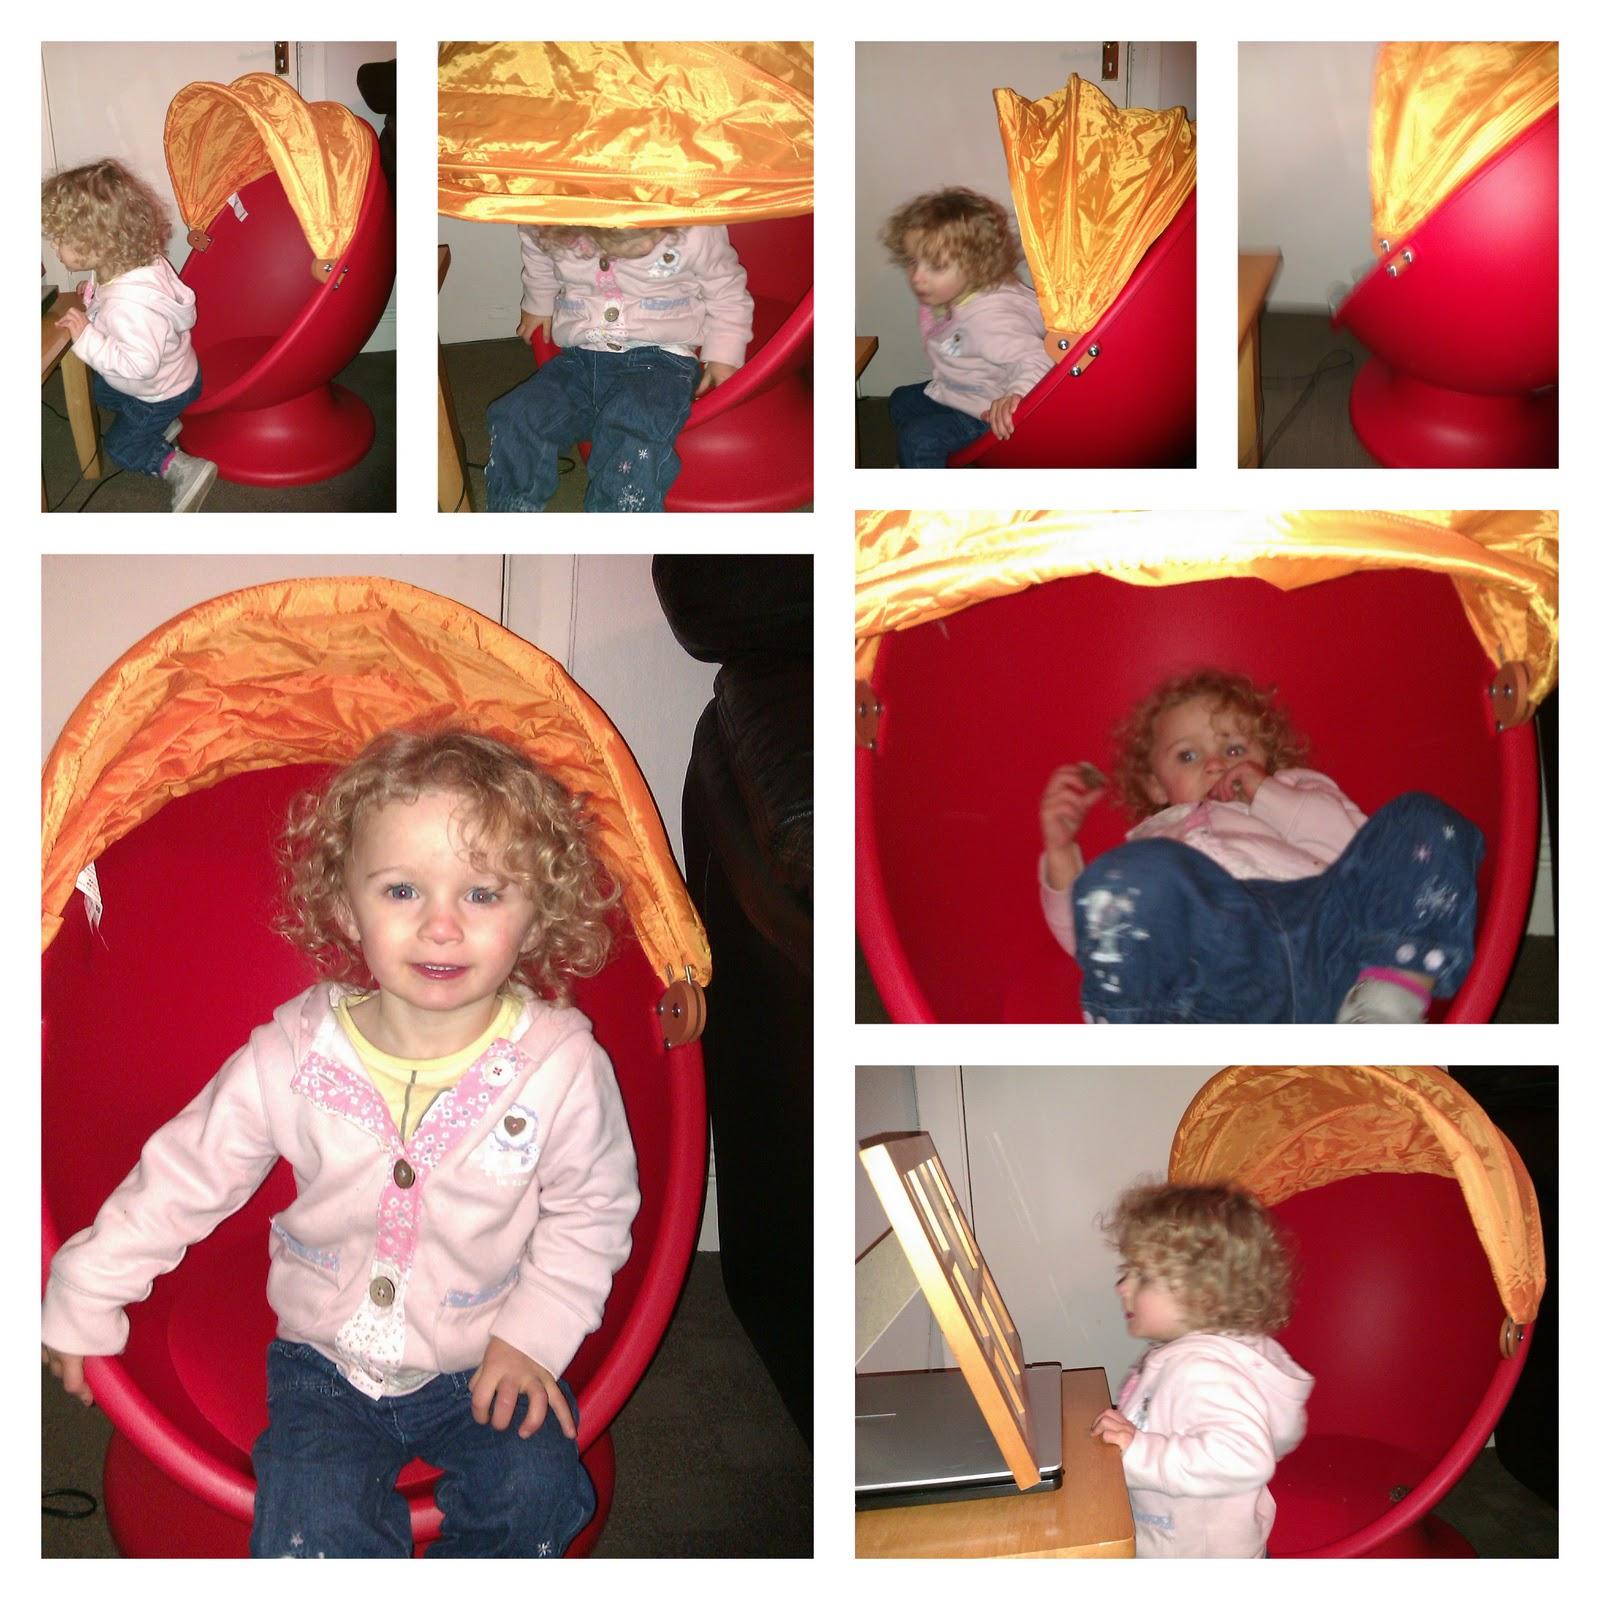 plastic toddler chair design tokyo review : ikea lÖmsk swivel | typecast